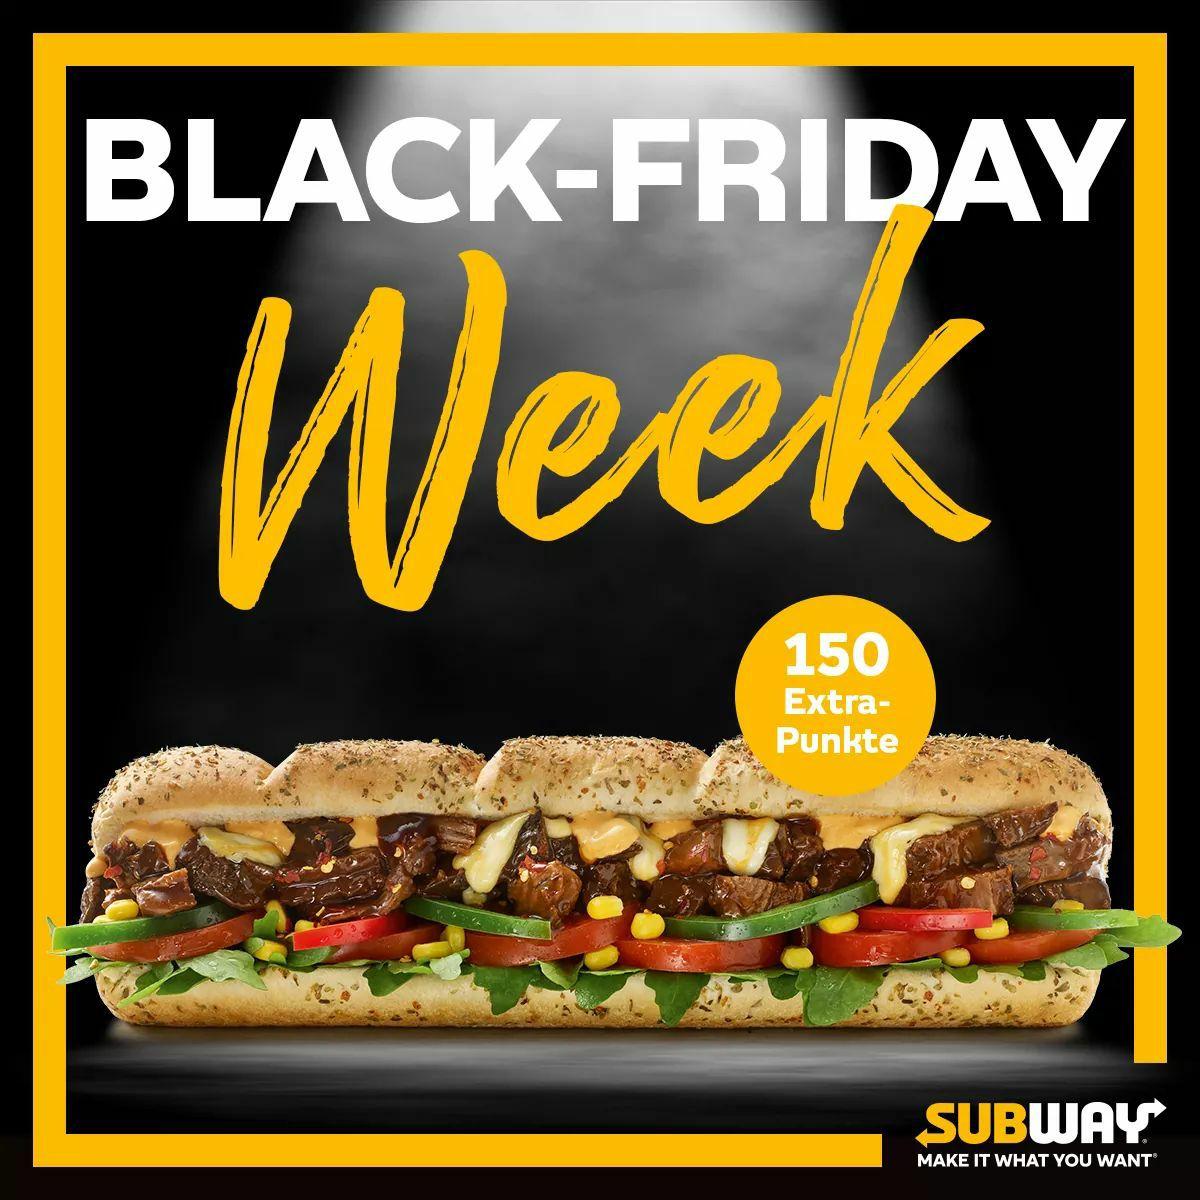 [Subway] Black-Friday Week 150 Extra-Punkte